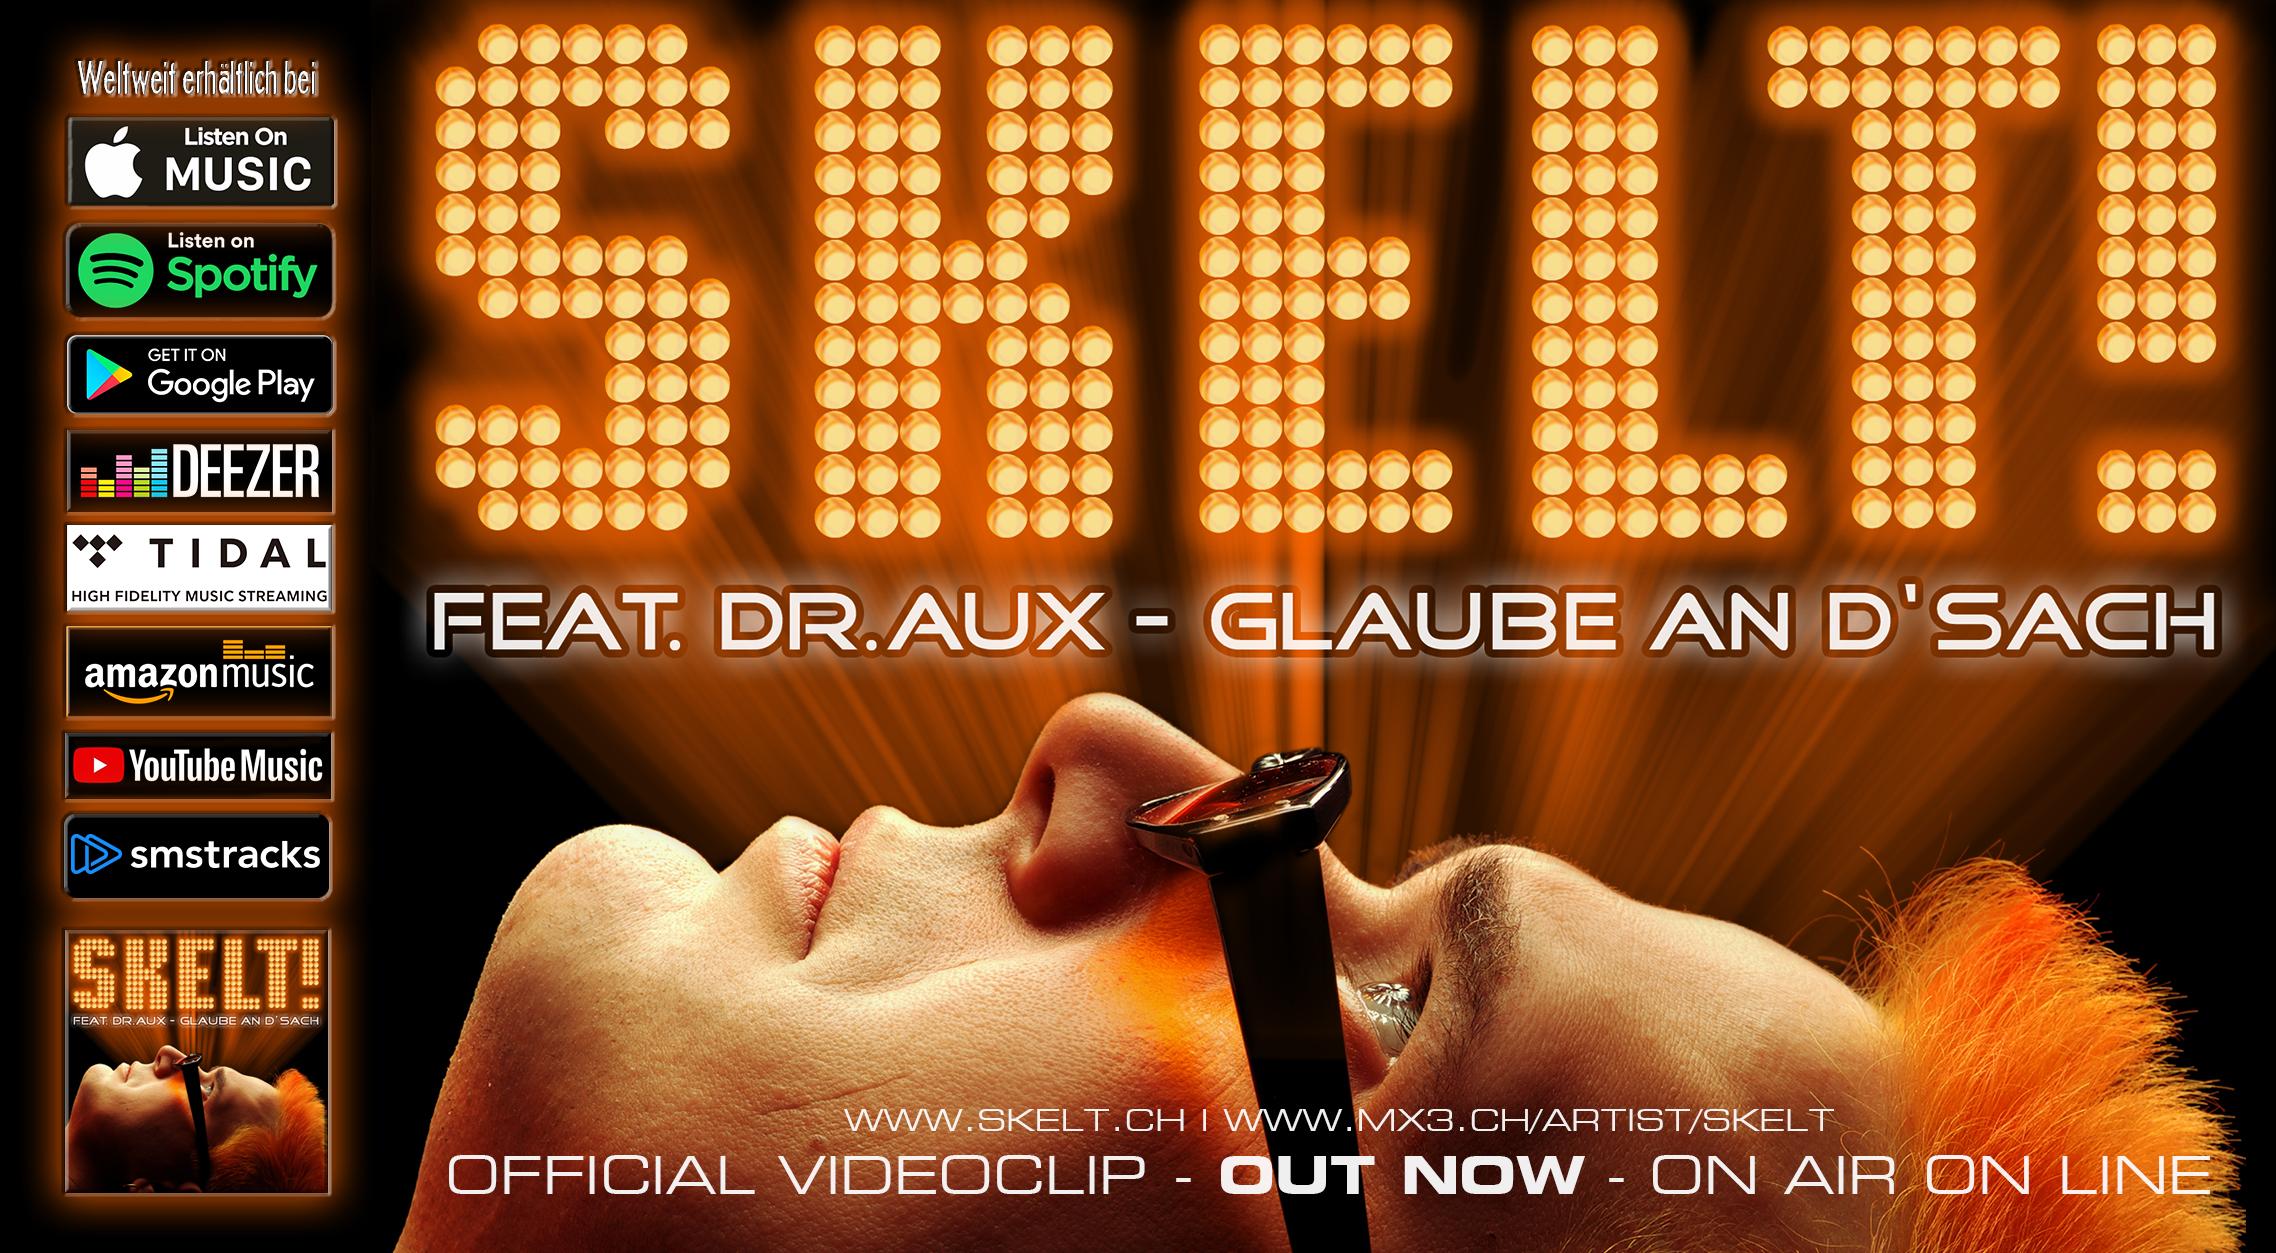 Skelt! feat. Dr.Aux - Glaube an d'Sach (Maxi / 2013)